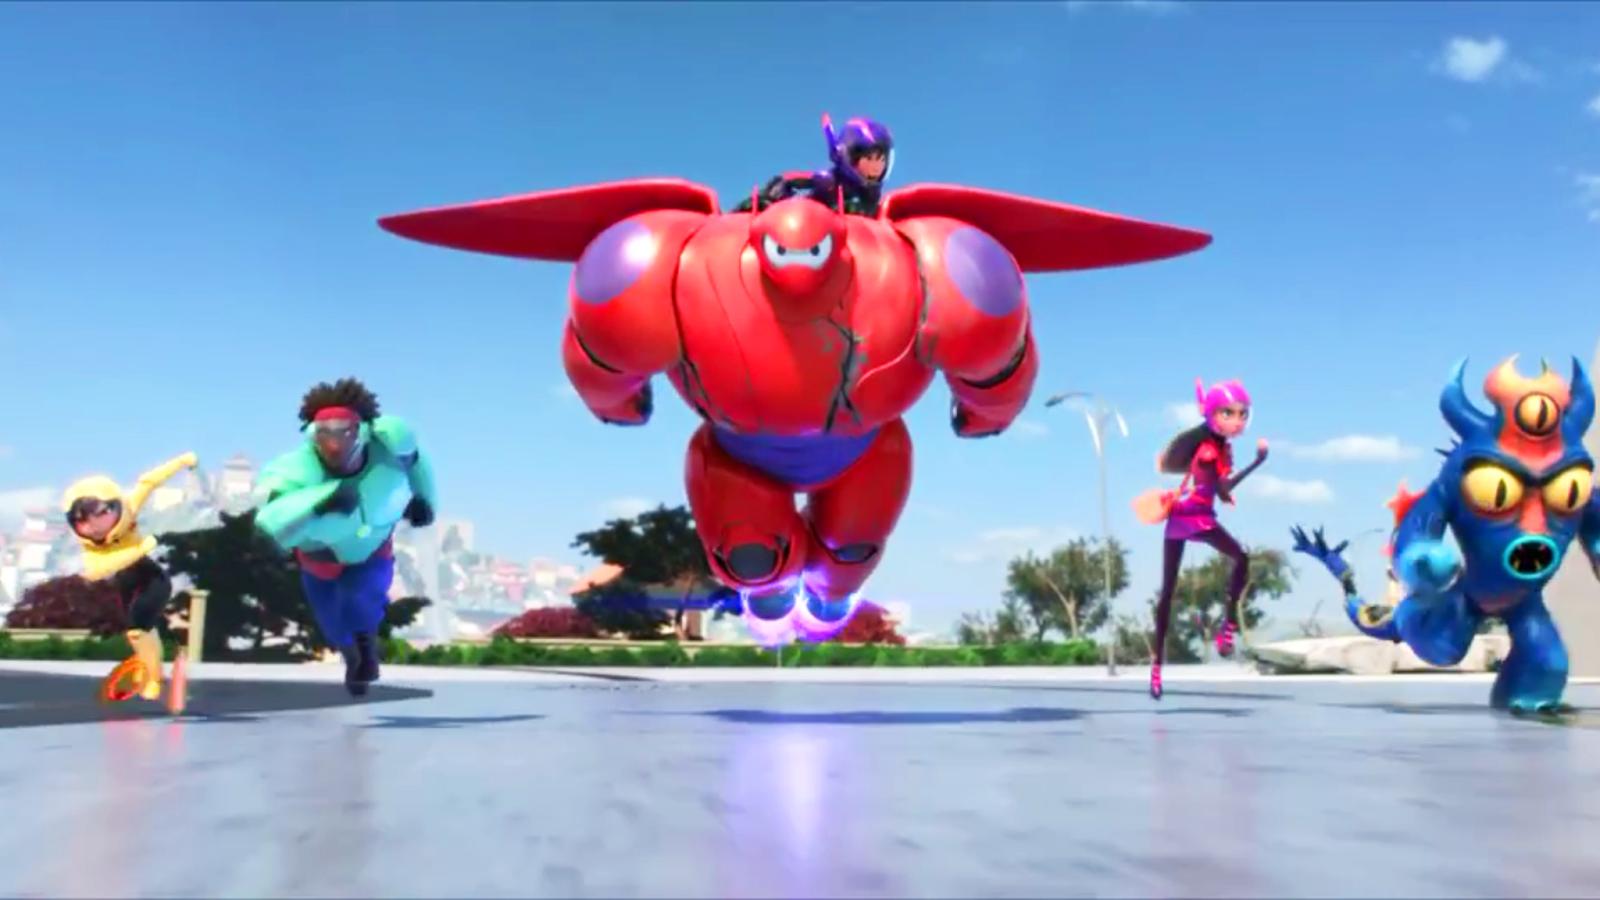 big hero 6 walt disney 2014 still screencaps personajes characters fredzilla baymax hiro hamada honey lemon gogo tomago wasabi no ginger